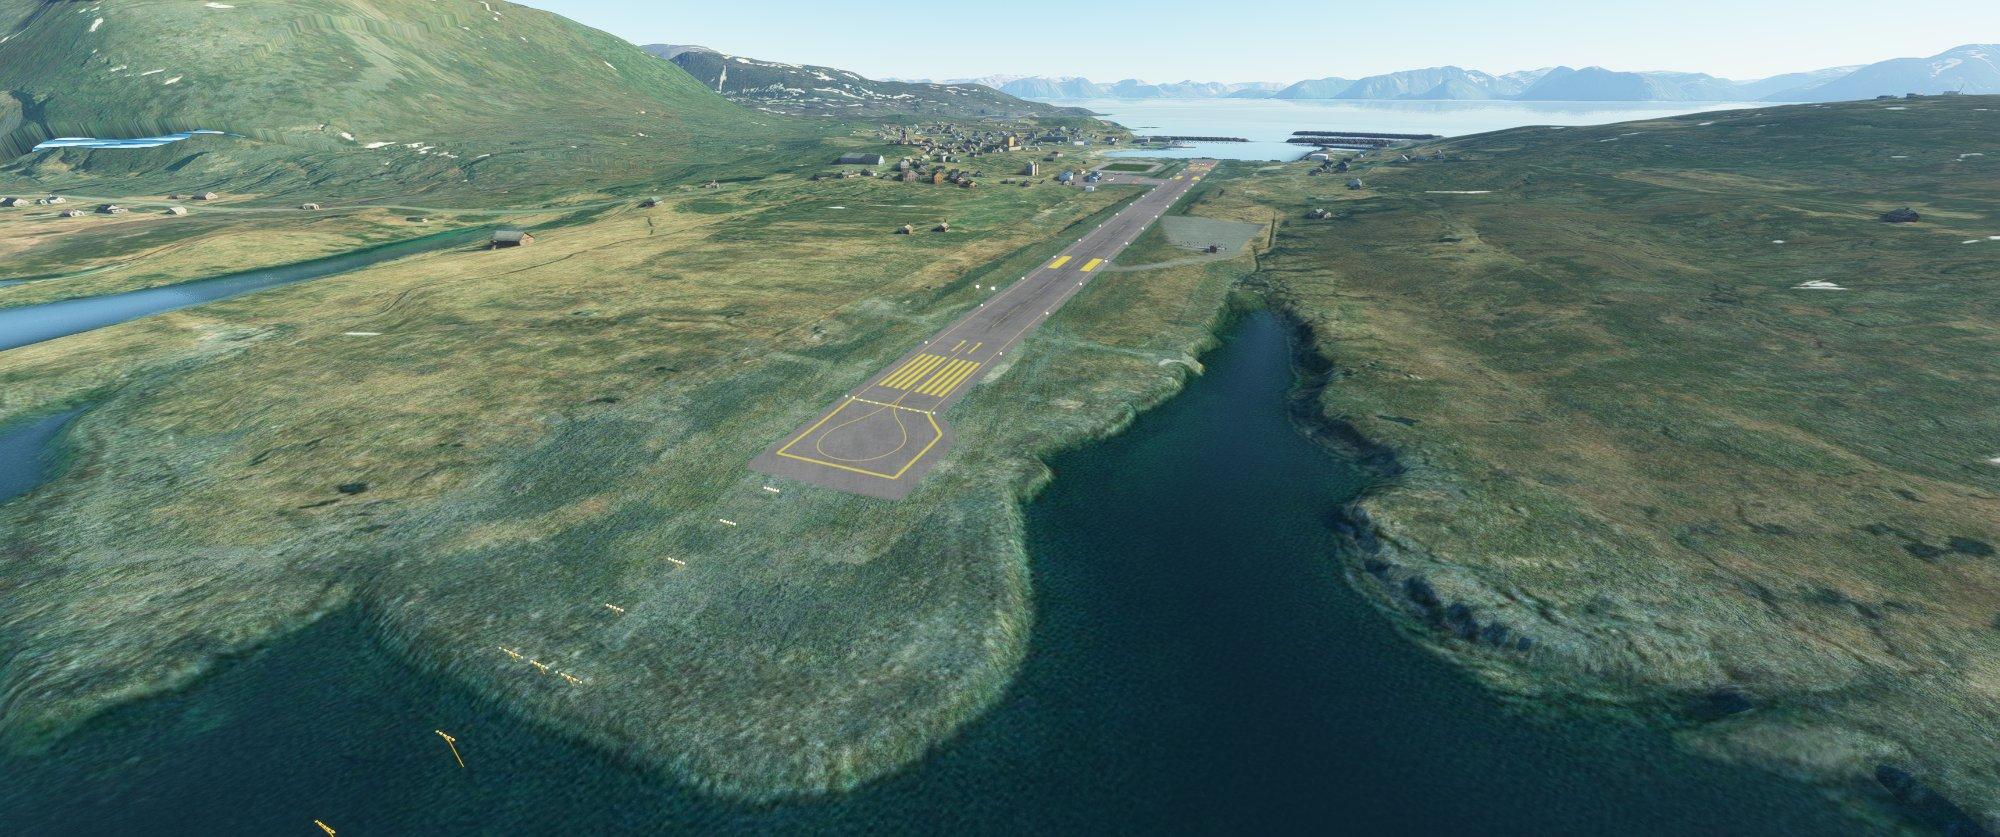 Microsoft Flight Simulator Screenshot 2020.11.20 - 12.56.07.79.jpg